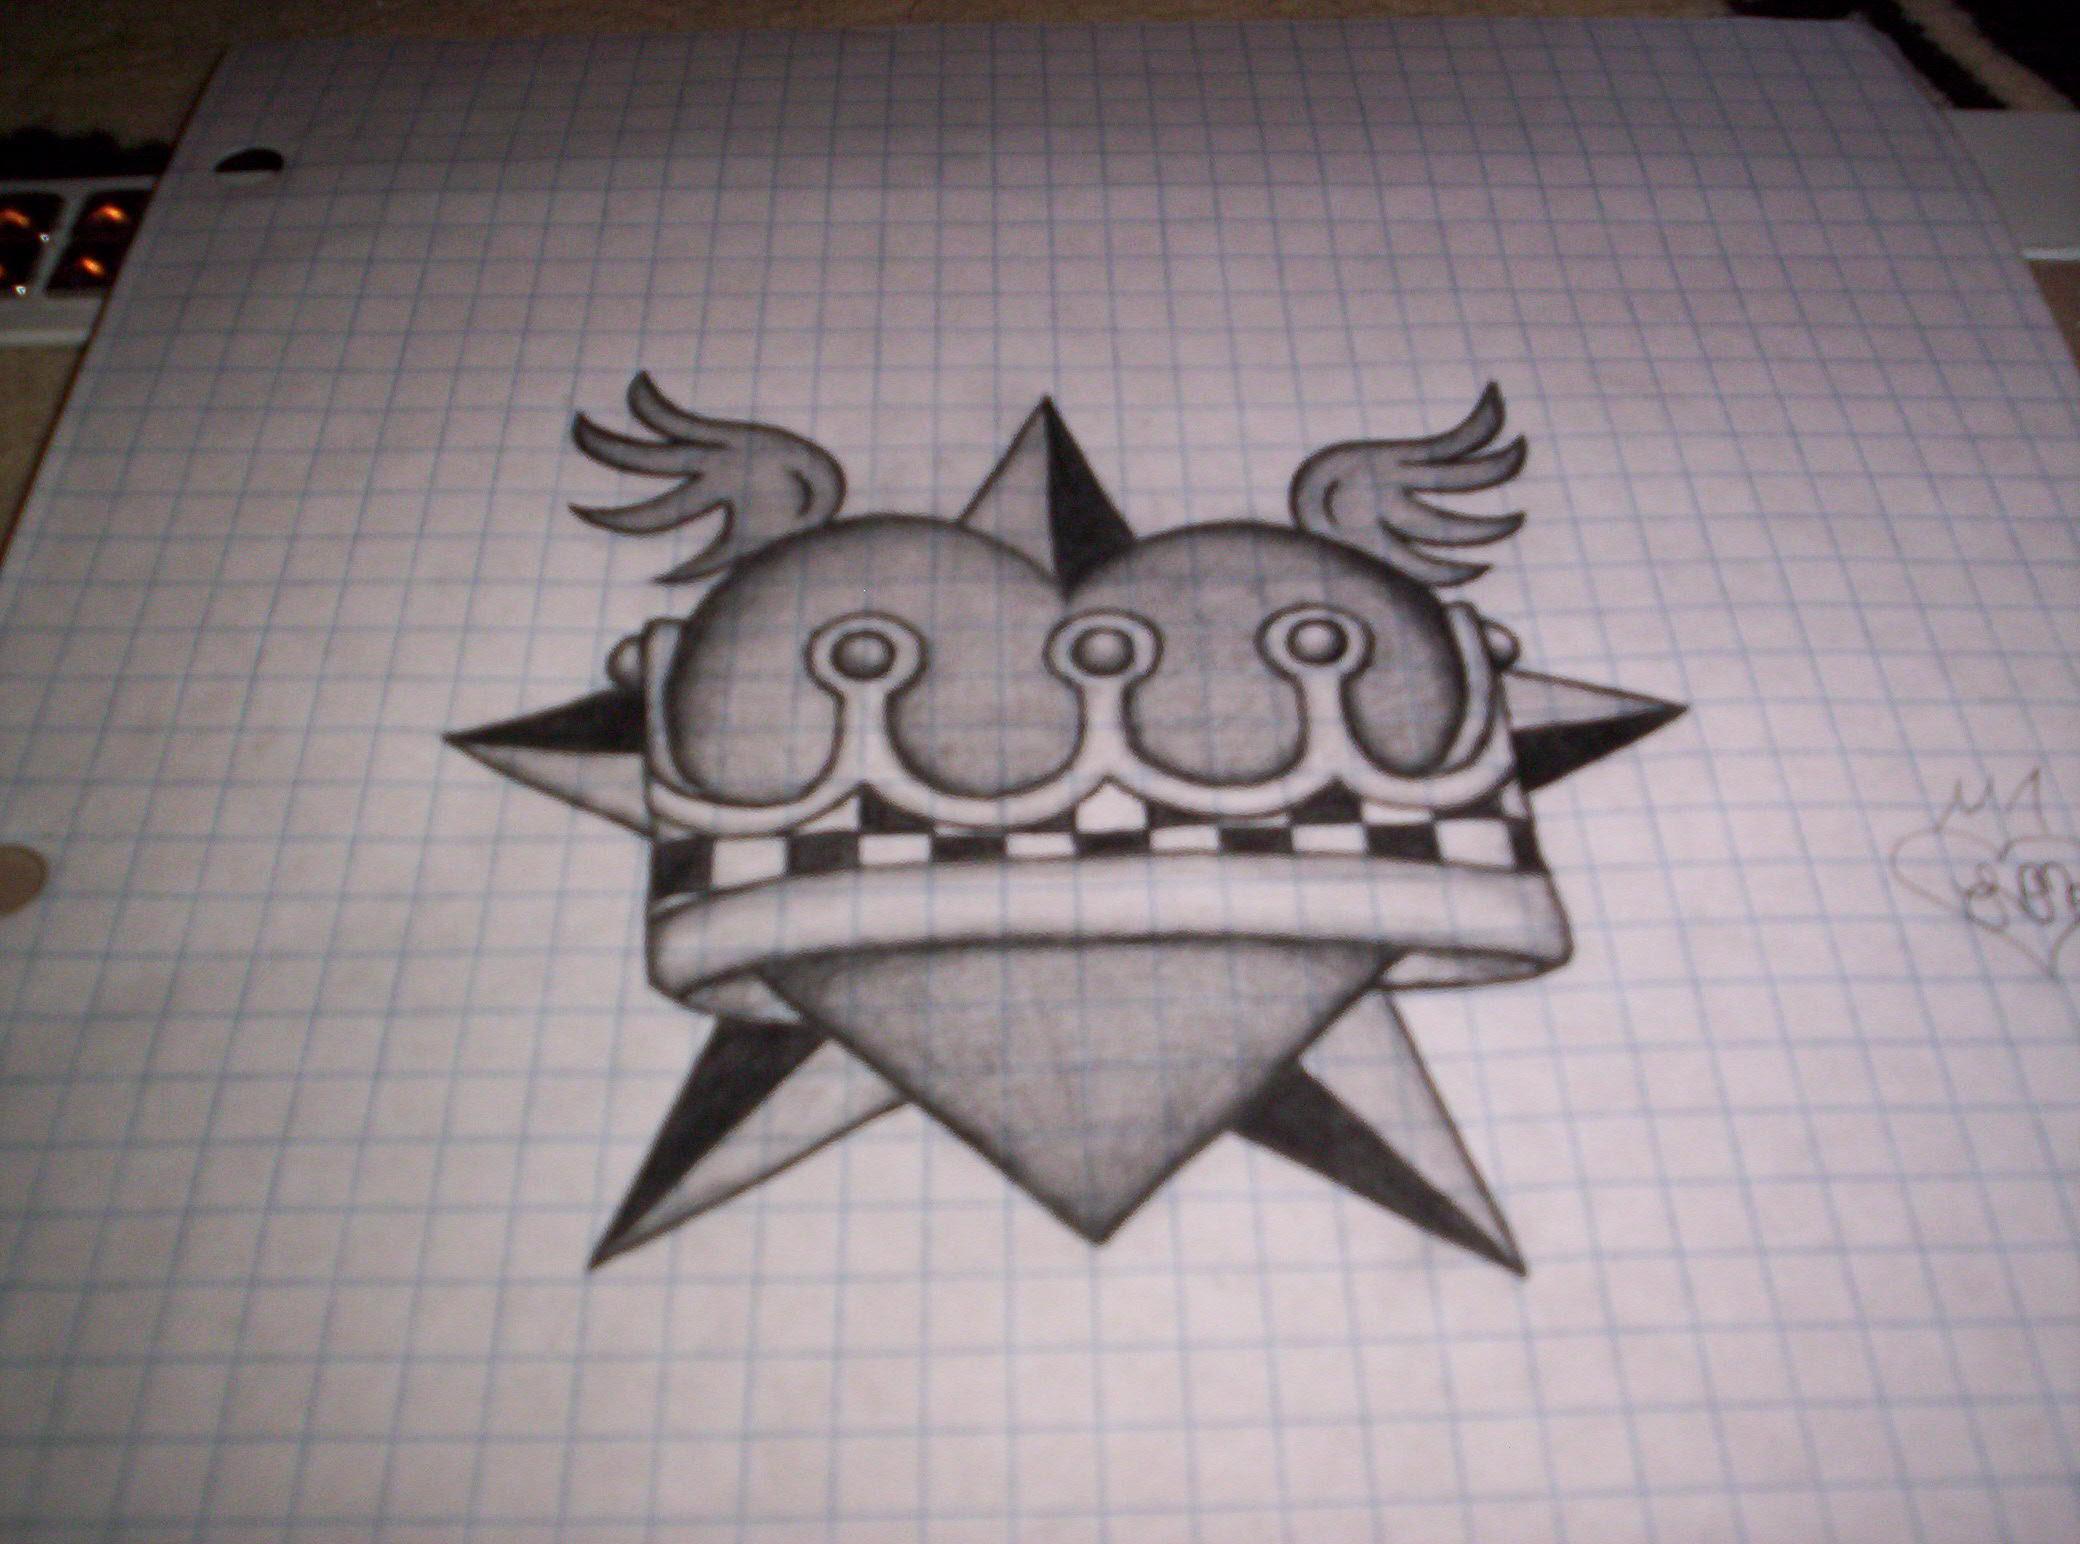 heart, crown, nautical star..? by Letseatjimy on DeviantArt